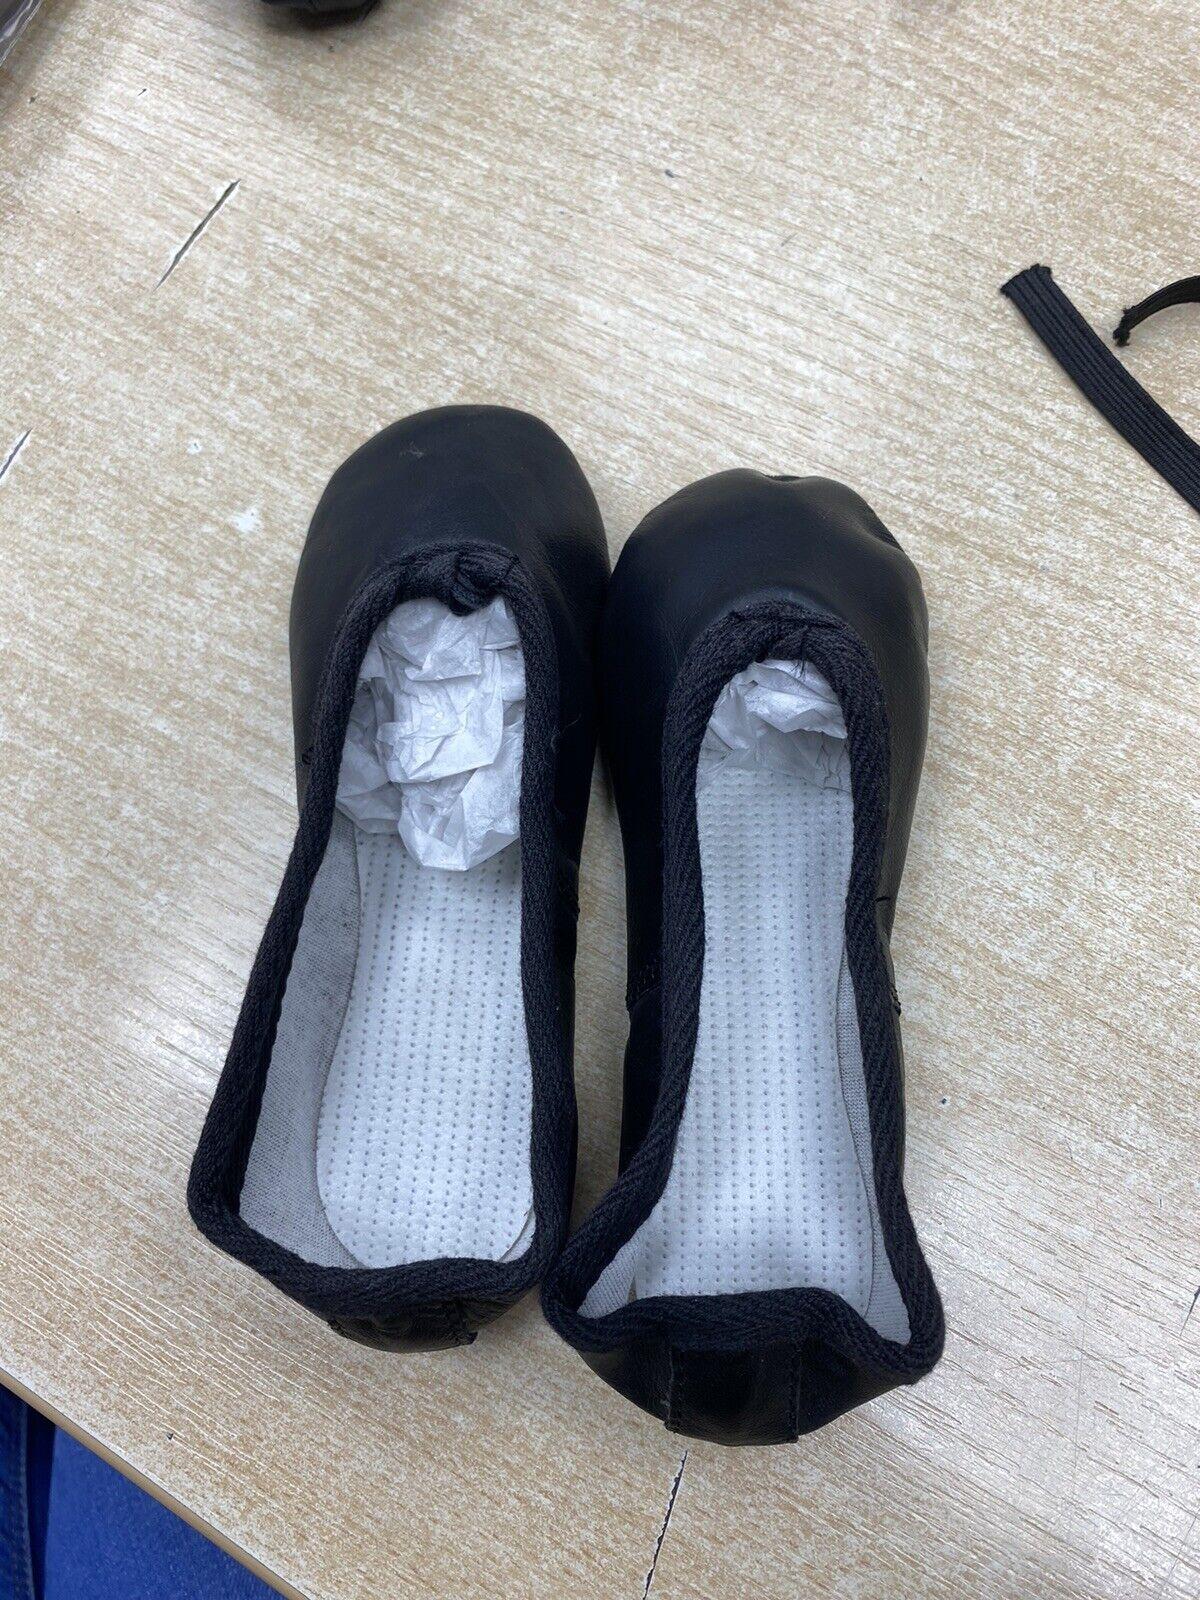 Black Leather Ballet Shoes - Infants Size 6